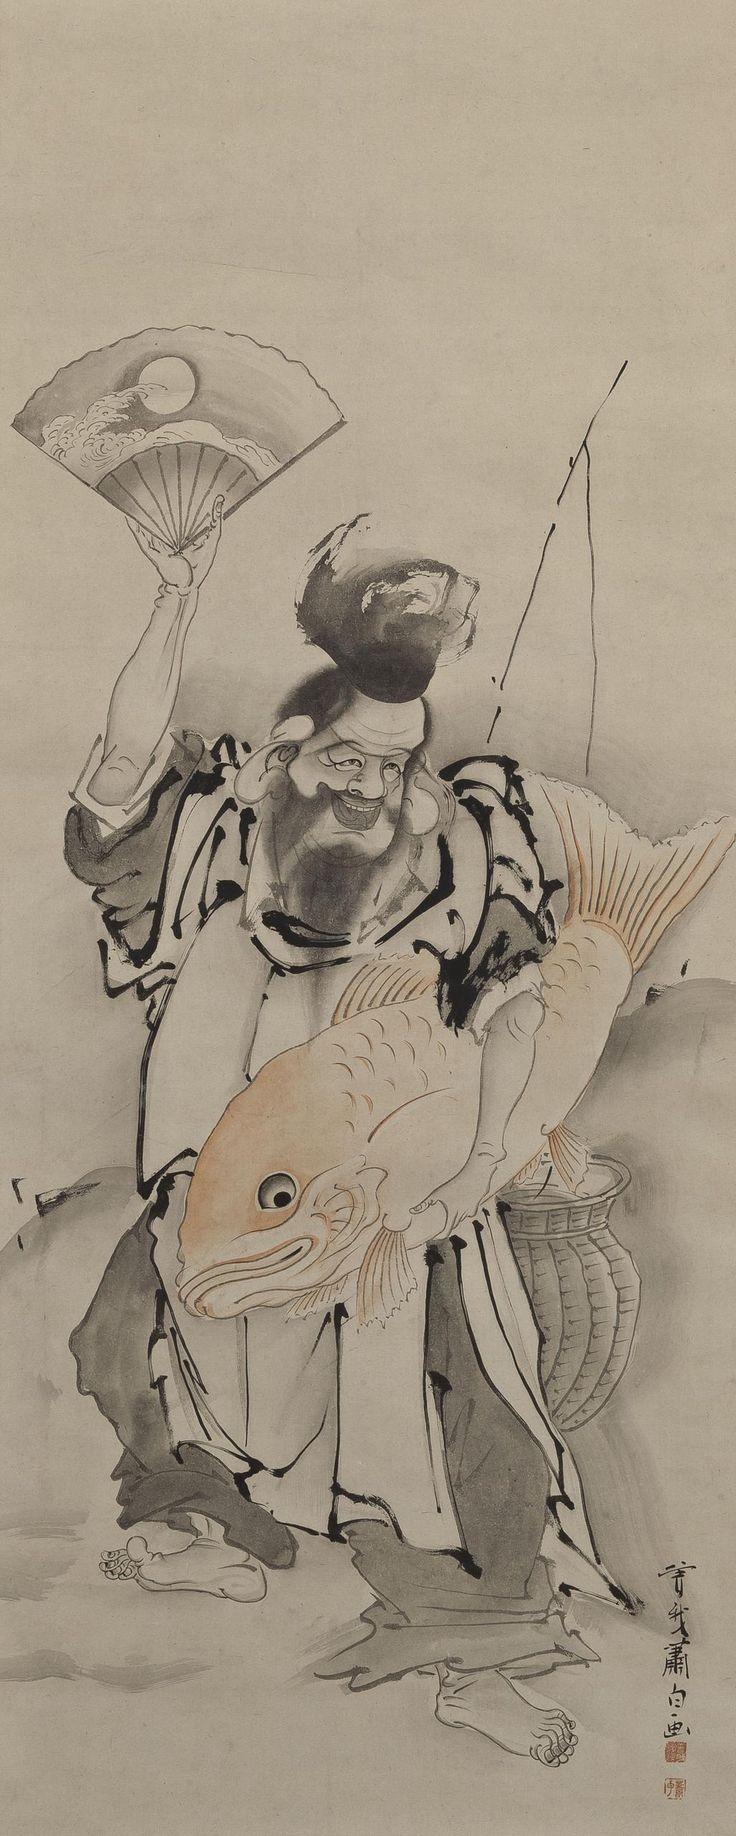 Ebisu 恵比寿 - Soga Shôhaku 1730-1781 曾我蕭白